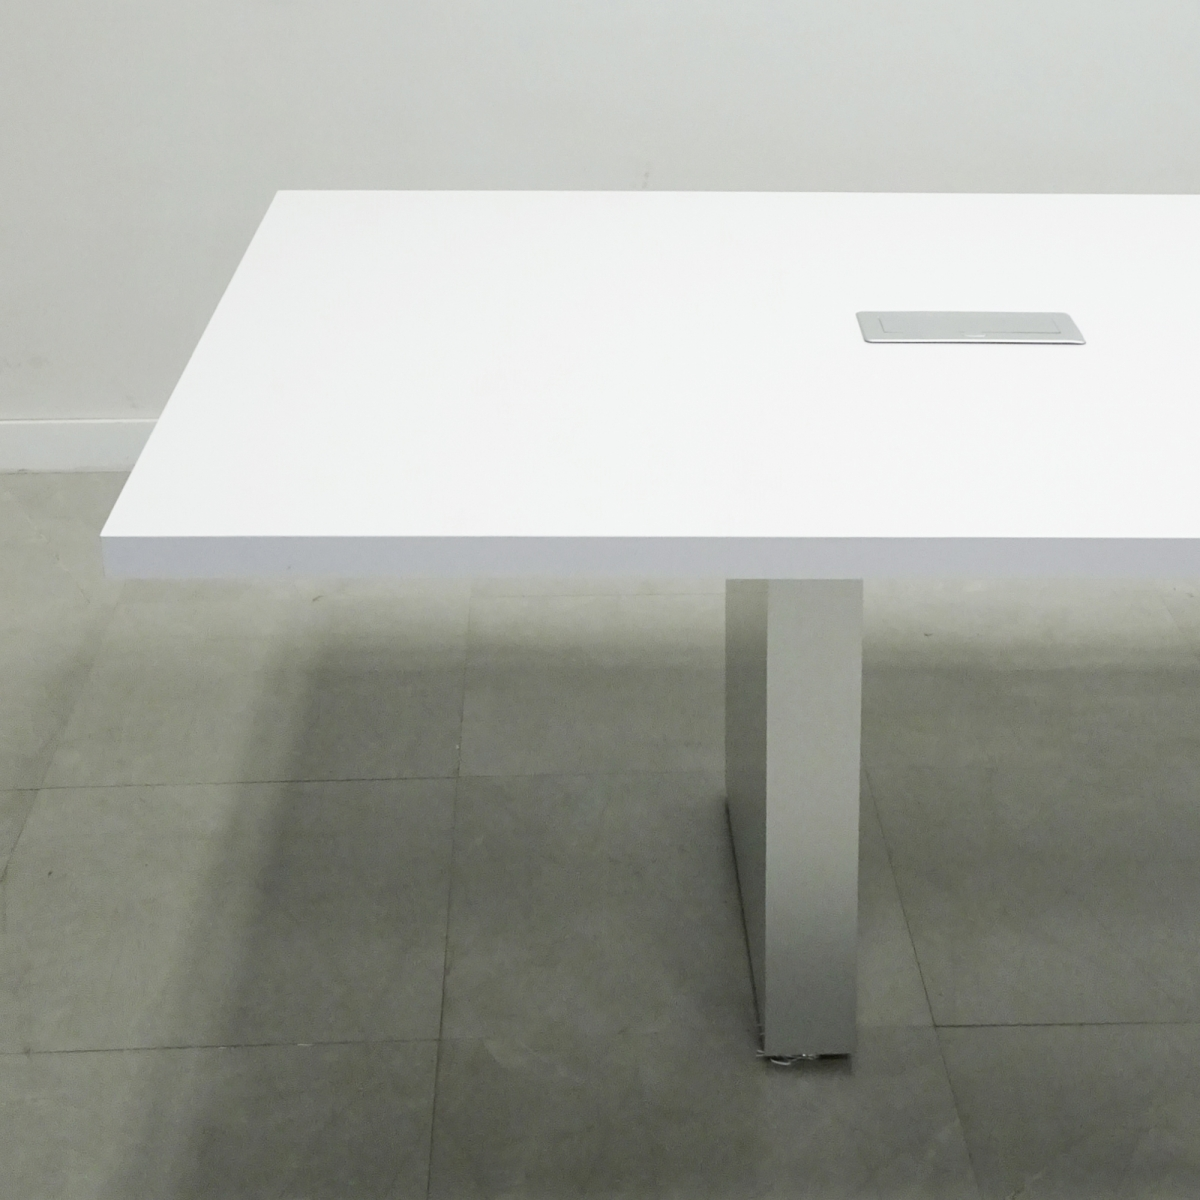 144 In. Rectangular Meeting Table